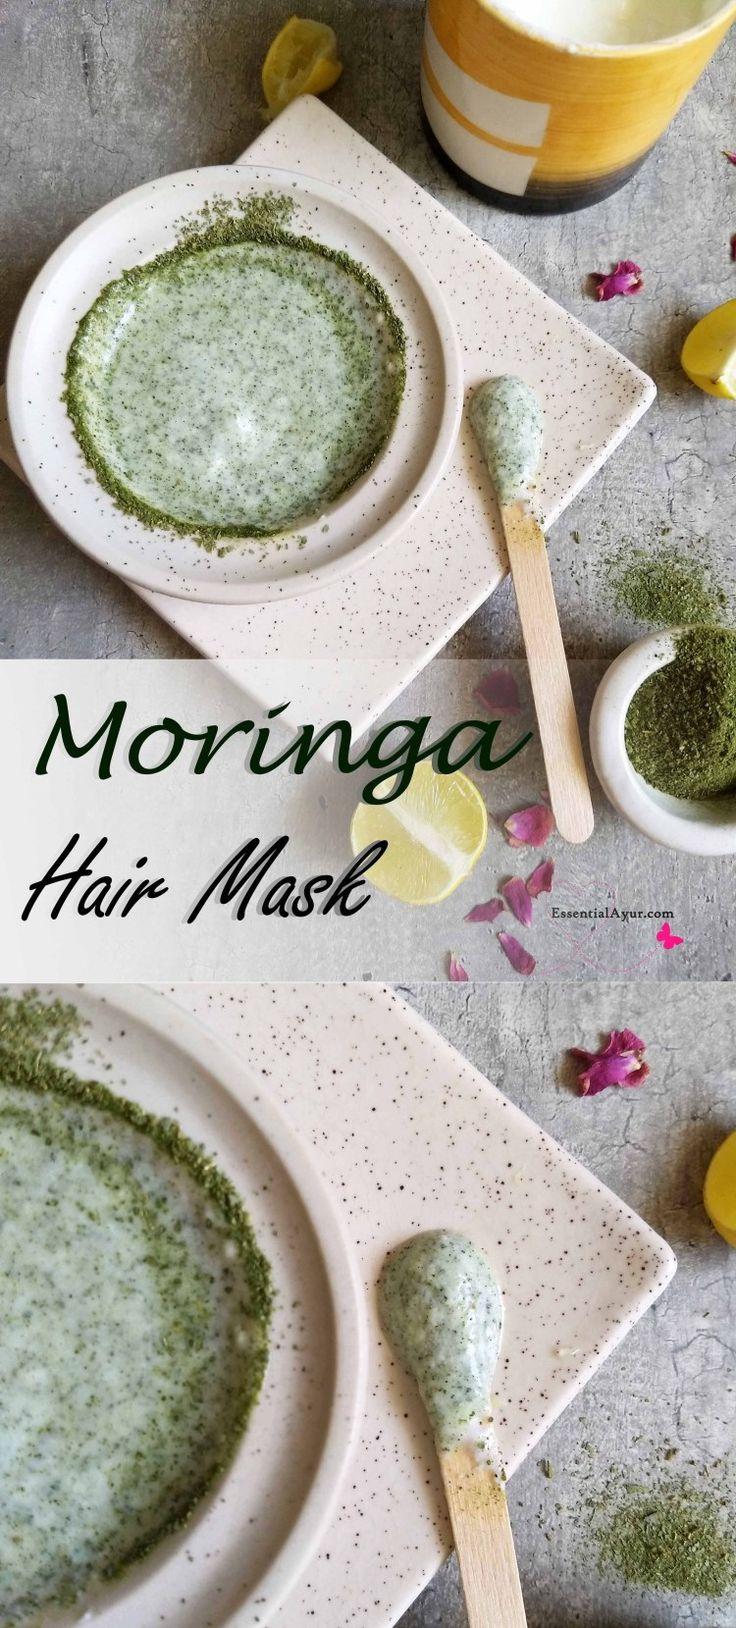 How to use moringa leaves for dandruff & scalp acne